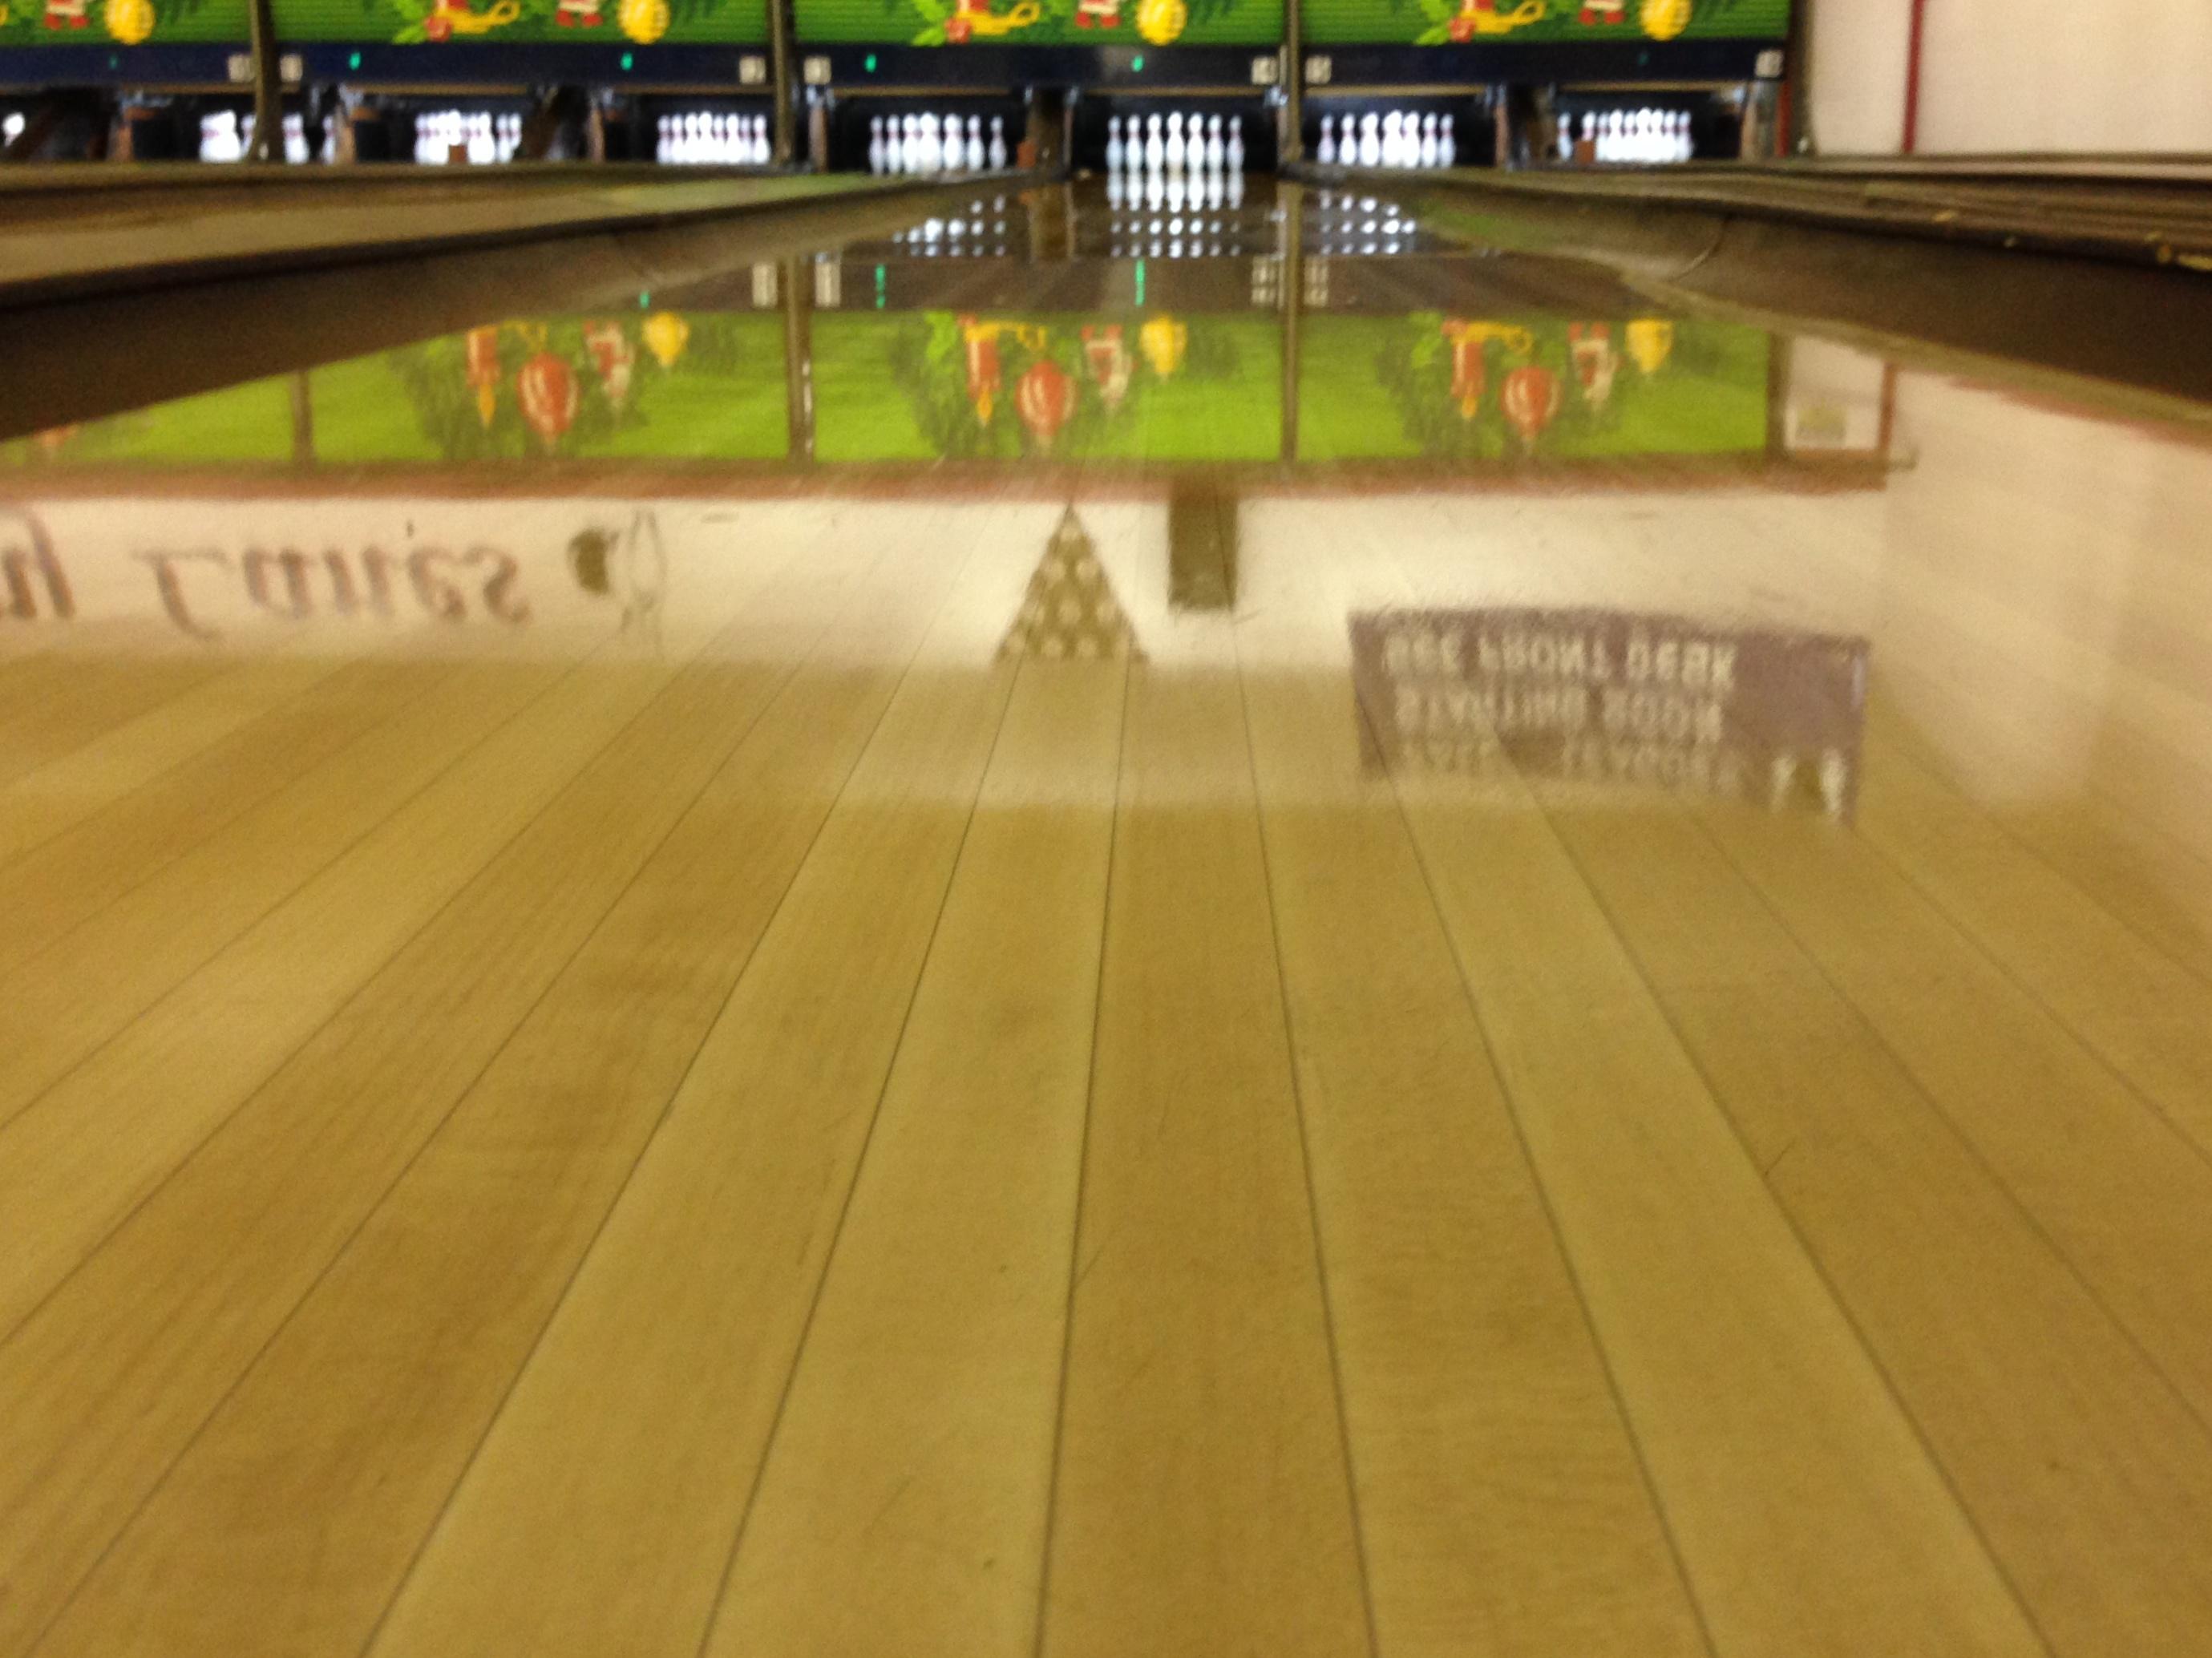 Free Images : floor, baseball field, hardwood, wood flooring, ball ...